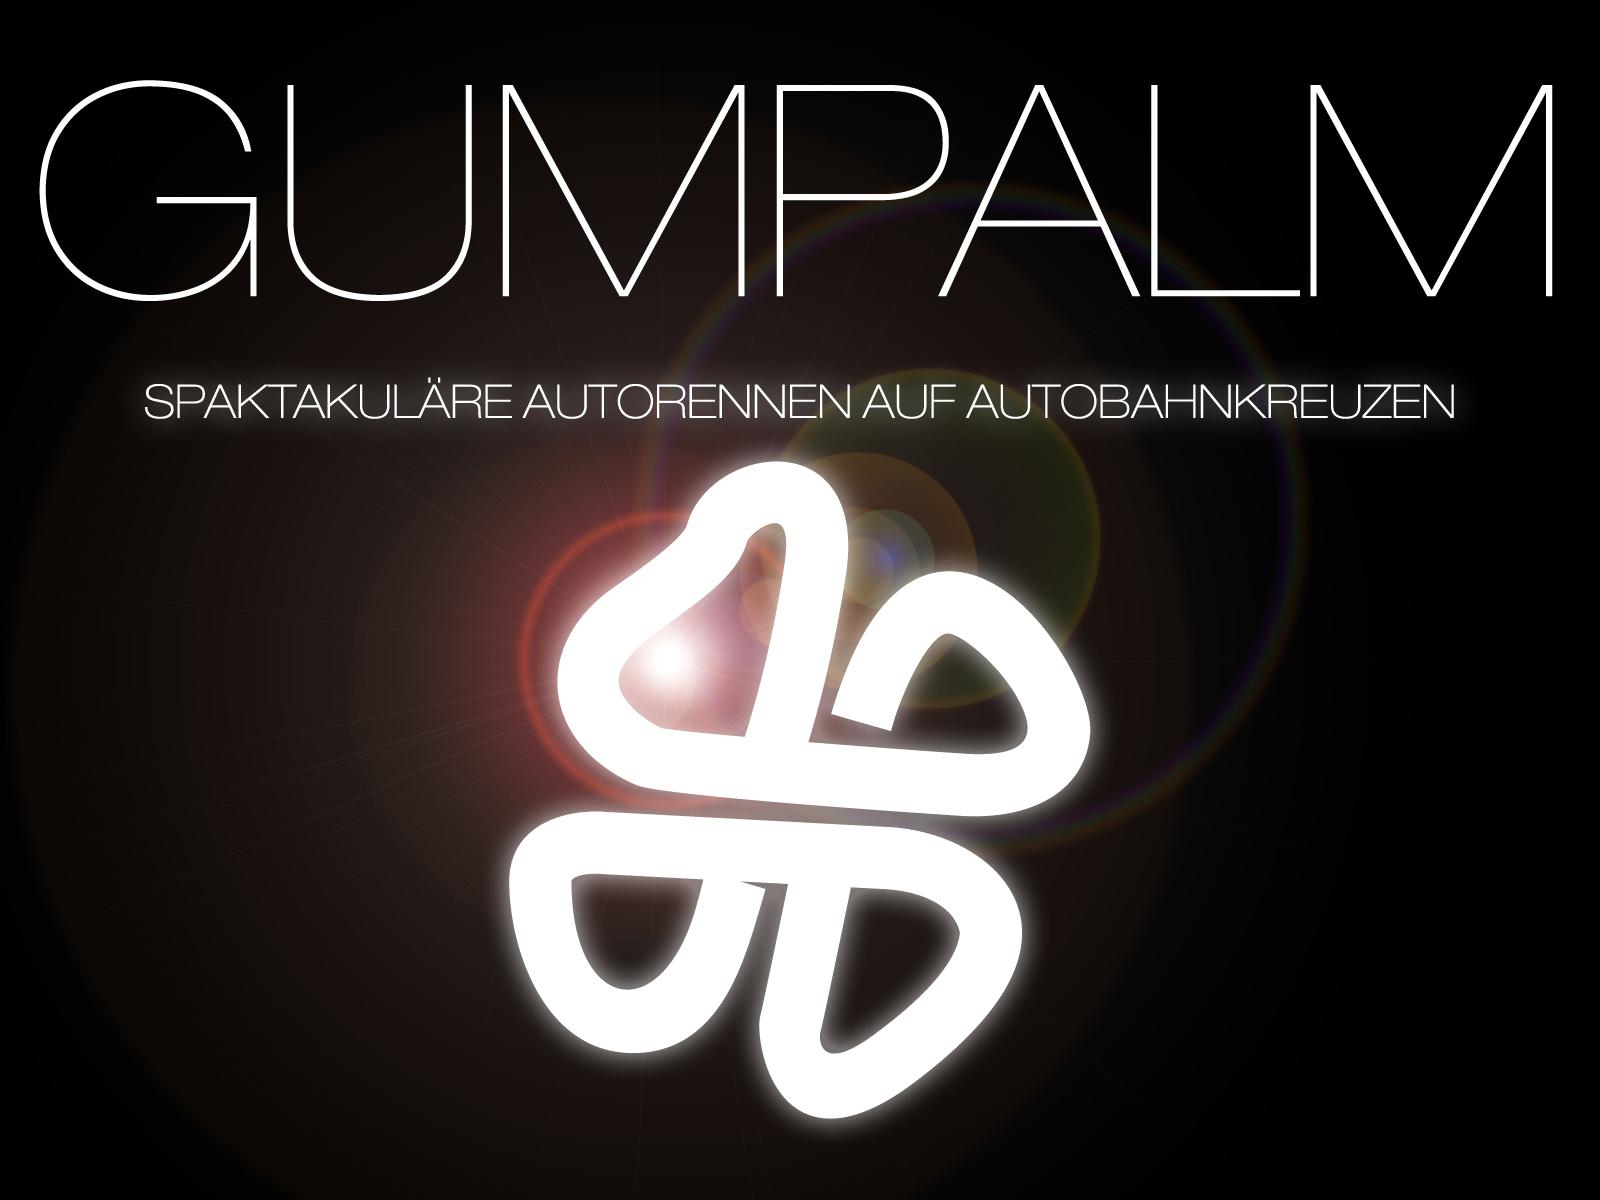 Gumpalm 12-12-12 - www.hartvoorautos.nl